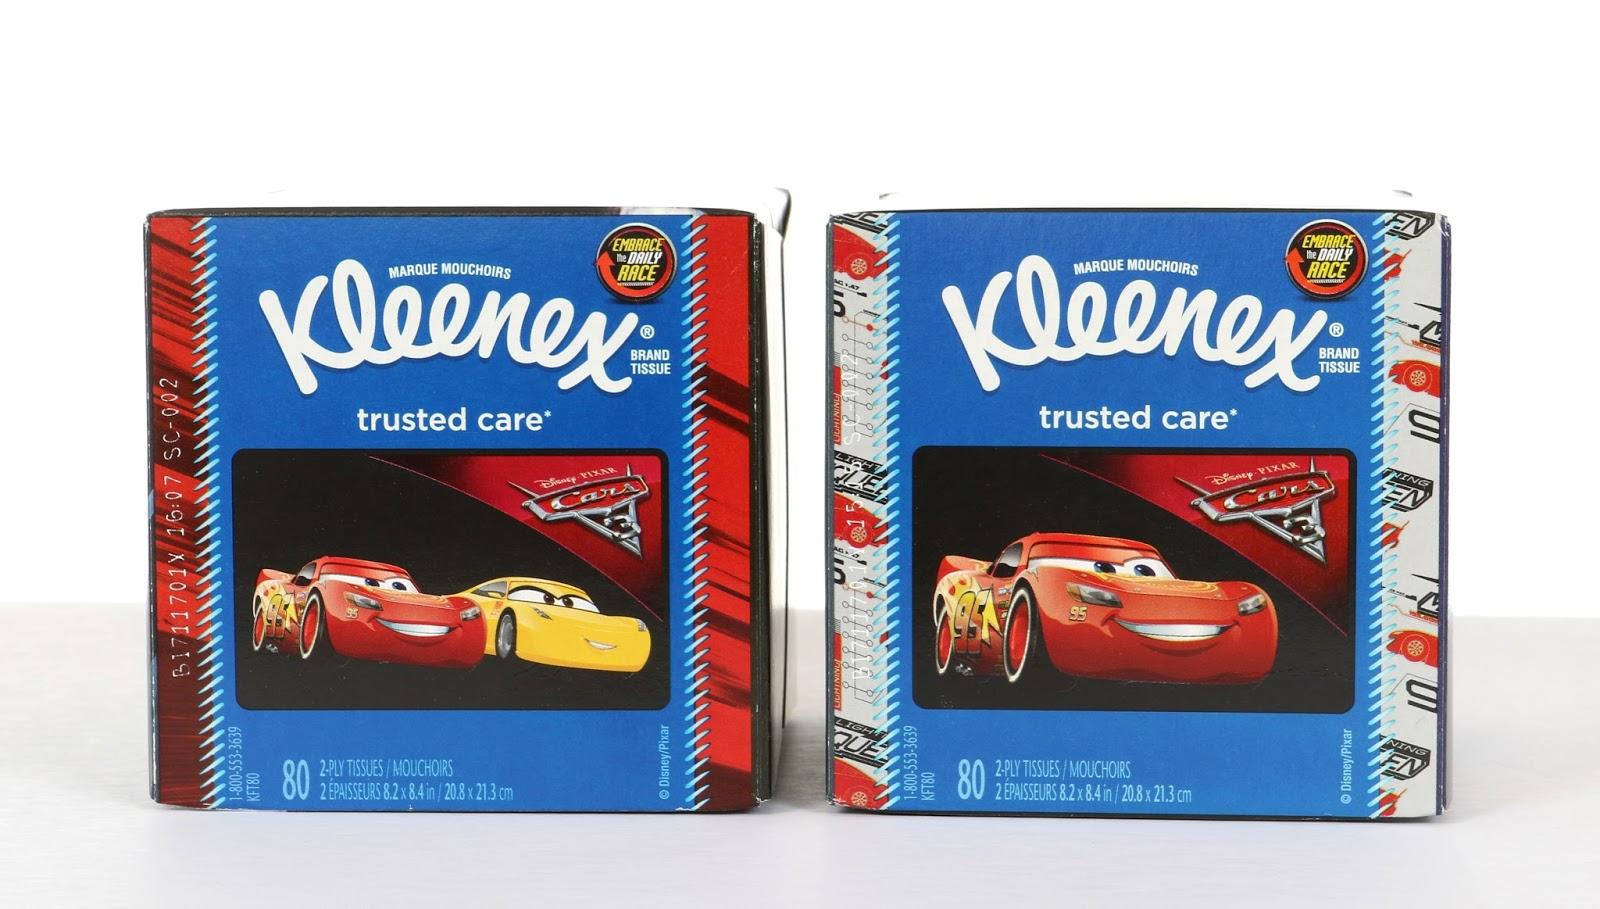 disney pixar cars 3 kleenex tissues